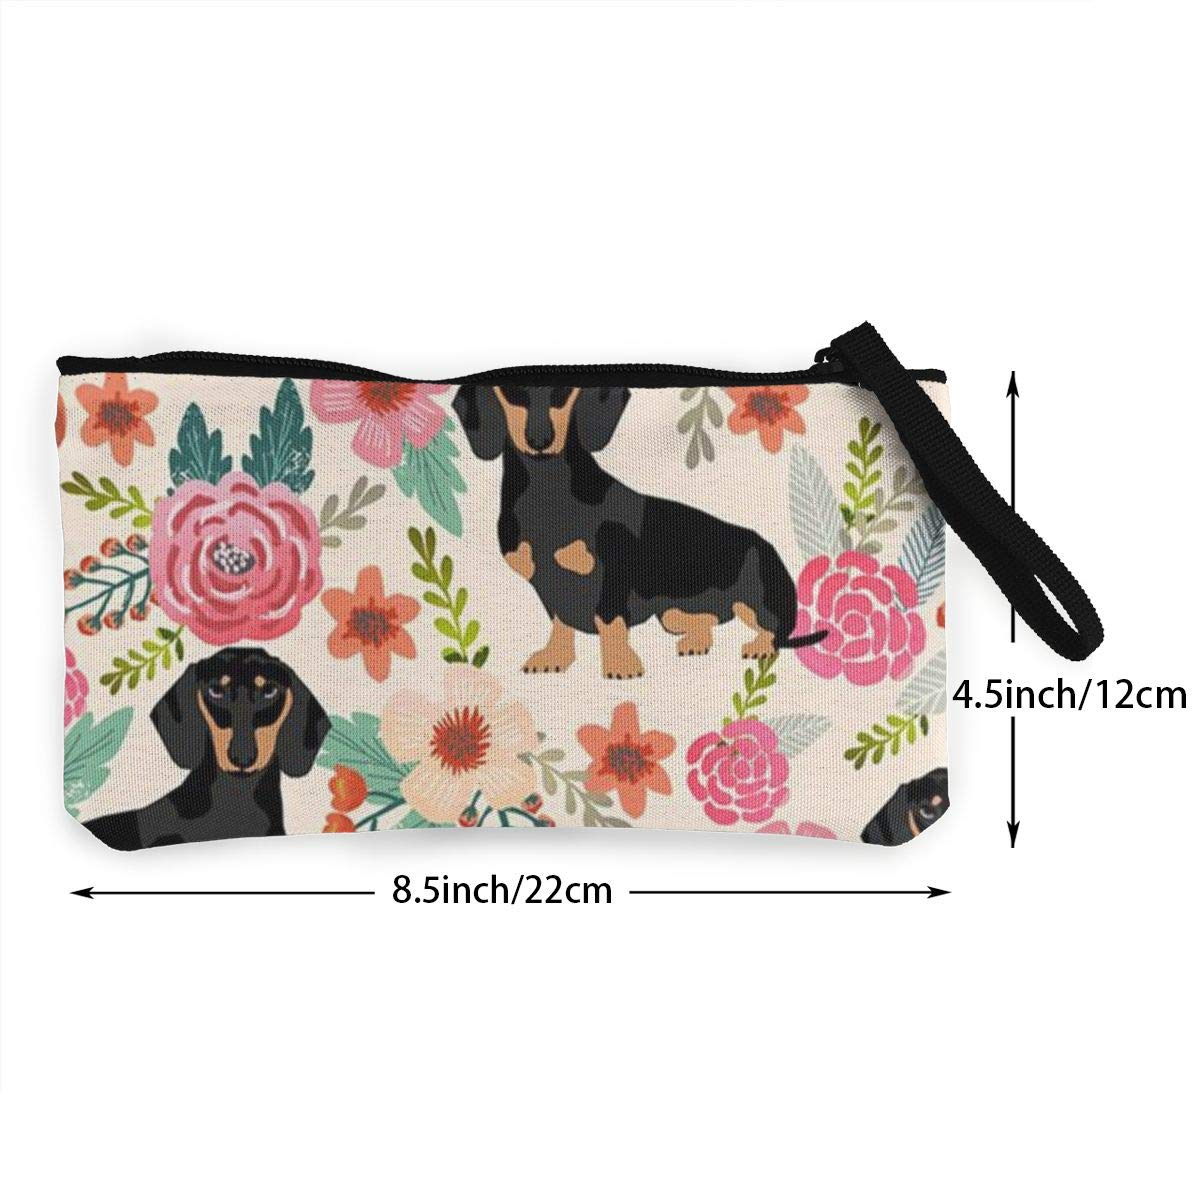 YUANSHAN Black Dogs Unisex Canvas Coin Purse Change Cash Bag Zipper Small Purse Wallets with Handle